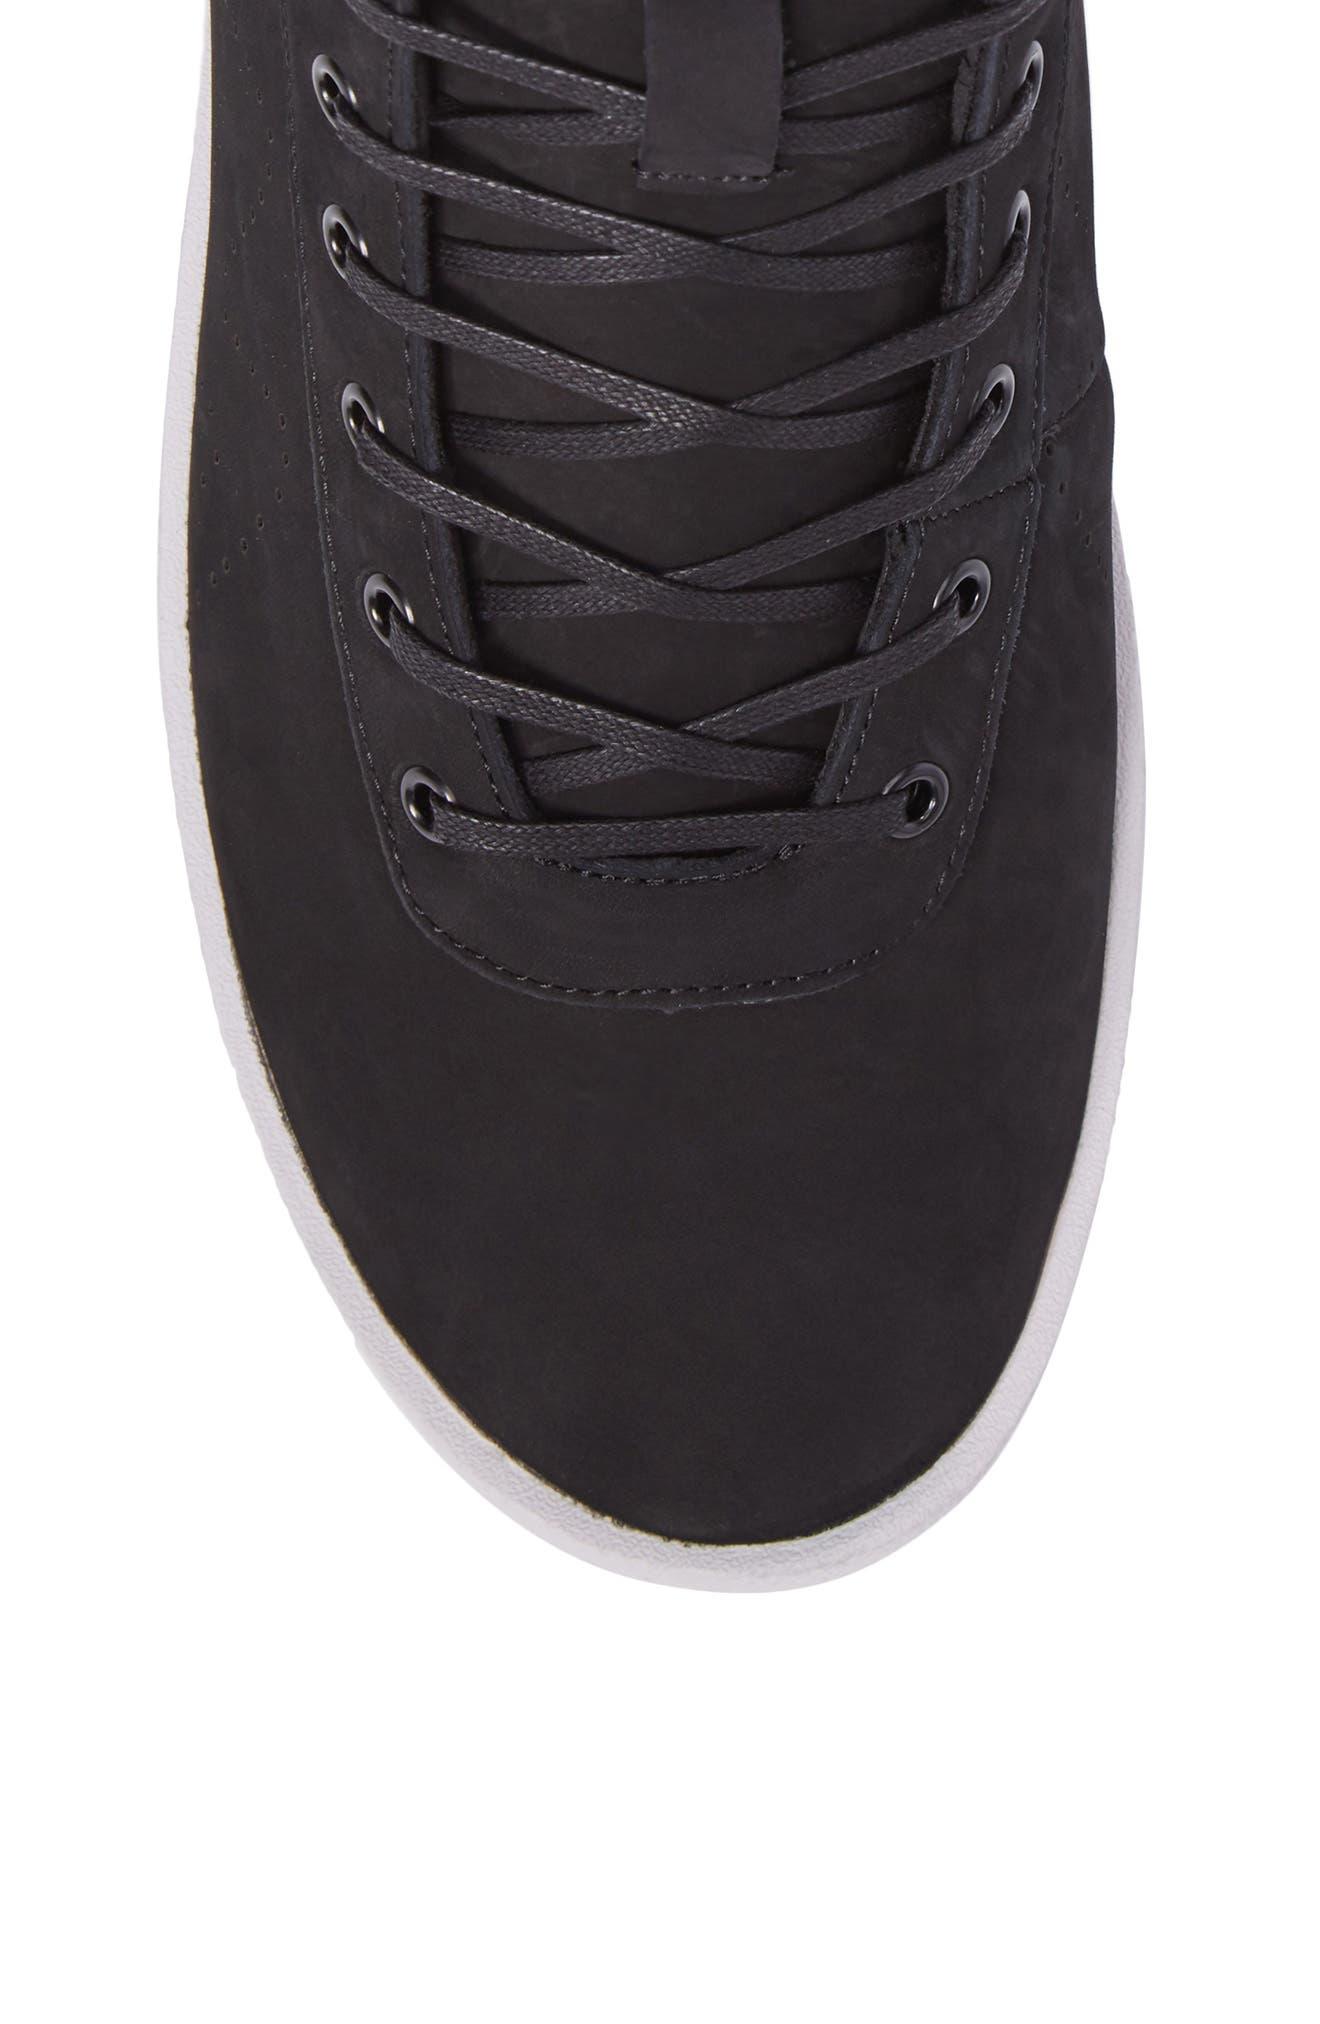 Highlander High Top Sneaker,                             Alternate thumbnail 5, color,                             001